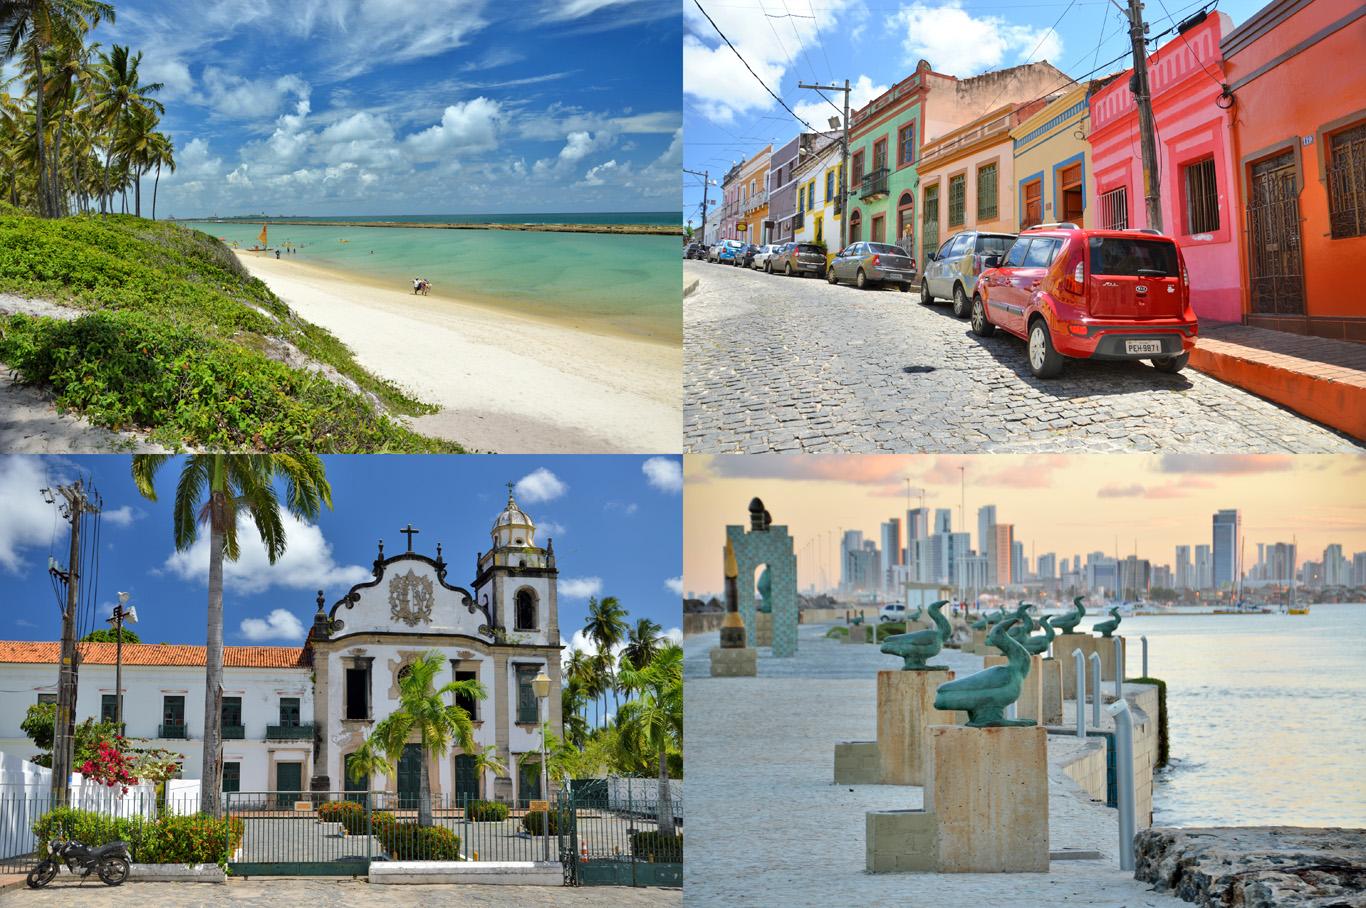 Porto de Galinhas, Olinda and Recife in Brazil